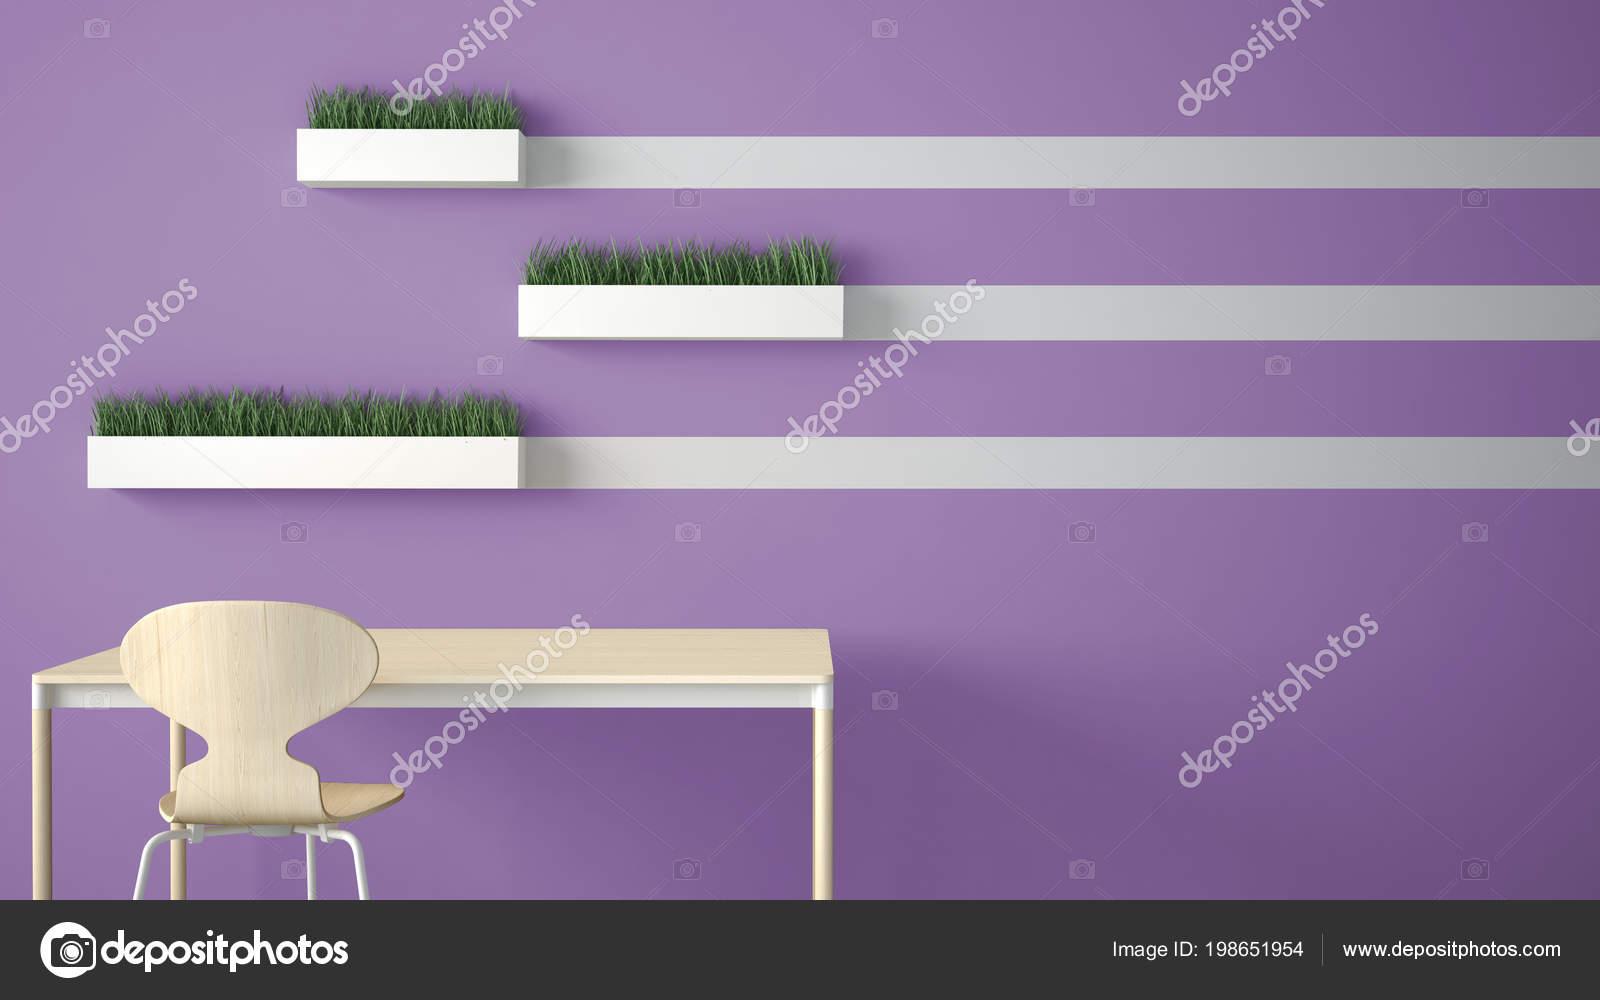 kitchen shelf ideas lights menards 简约的建筑师设计理念桌子和椅子厨房或办公室与架子与草花瓶在紫罗兰色 简约的建筑师设计理念 桌子和椅子 厨房或办公室与架子与草花瓶在紫罗兰色背景 室内设计想法与拷贝空间 照片作者archiviz